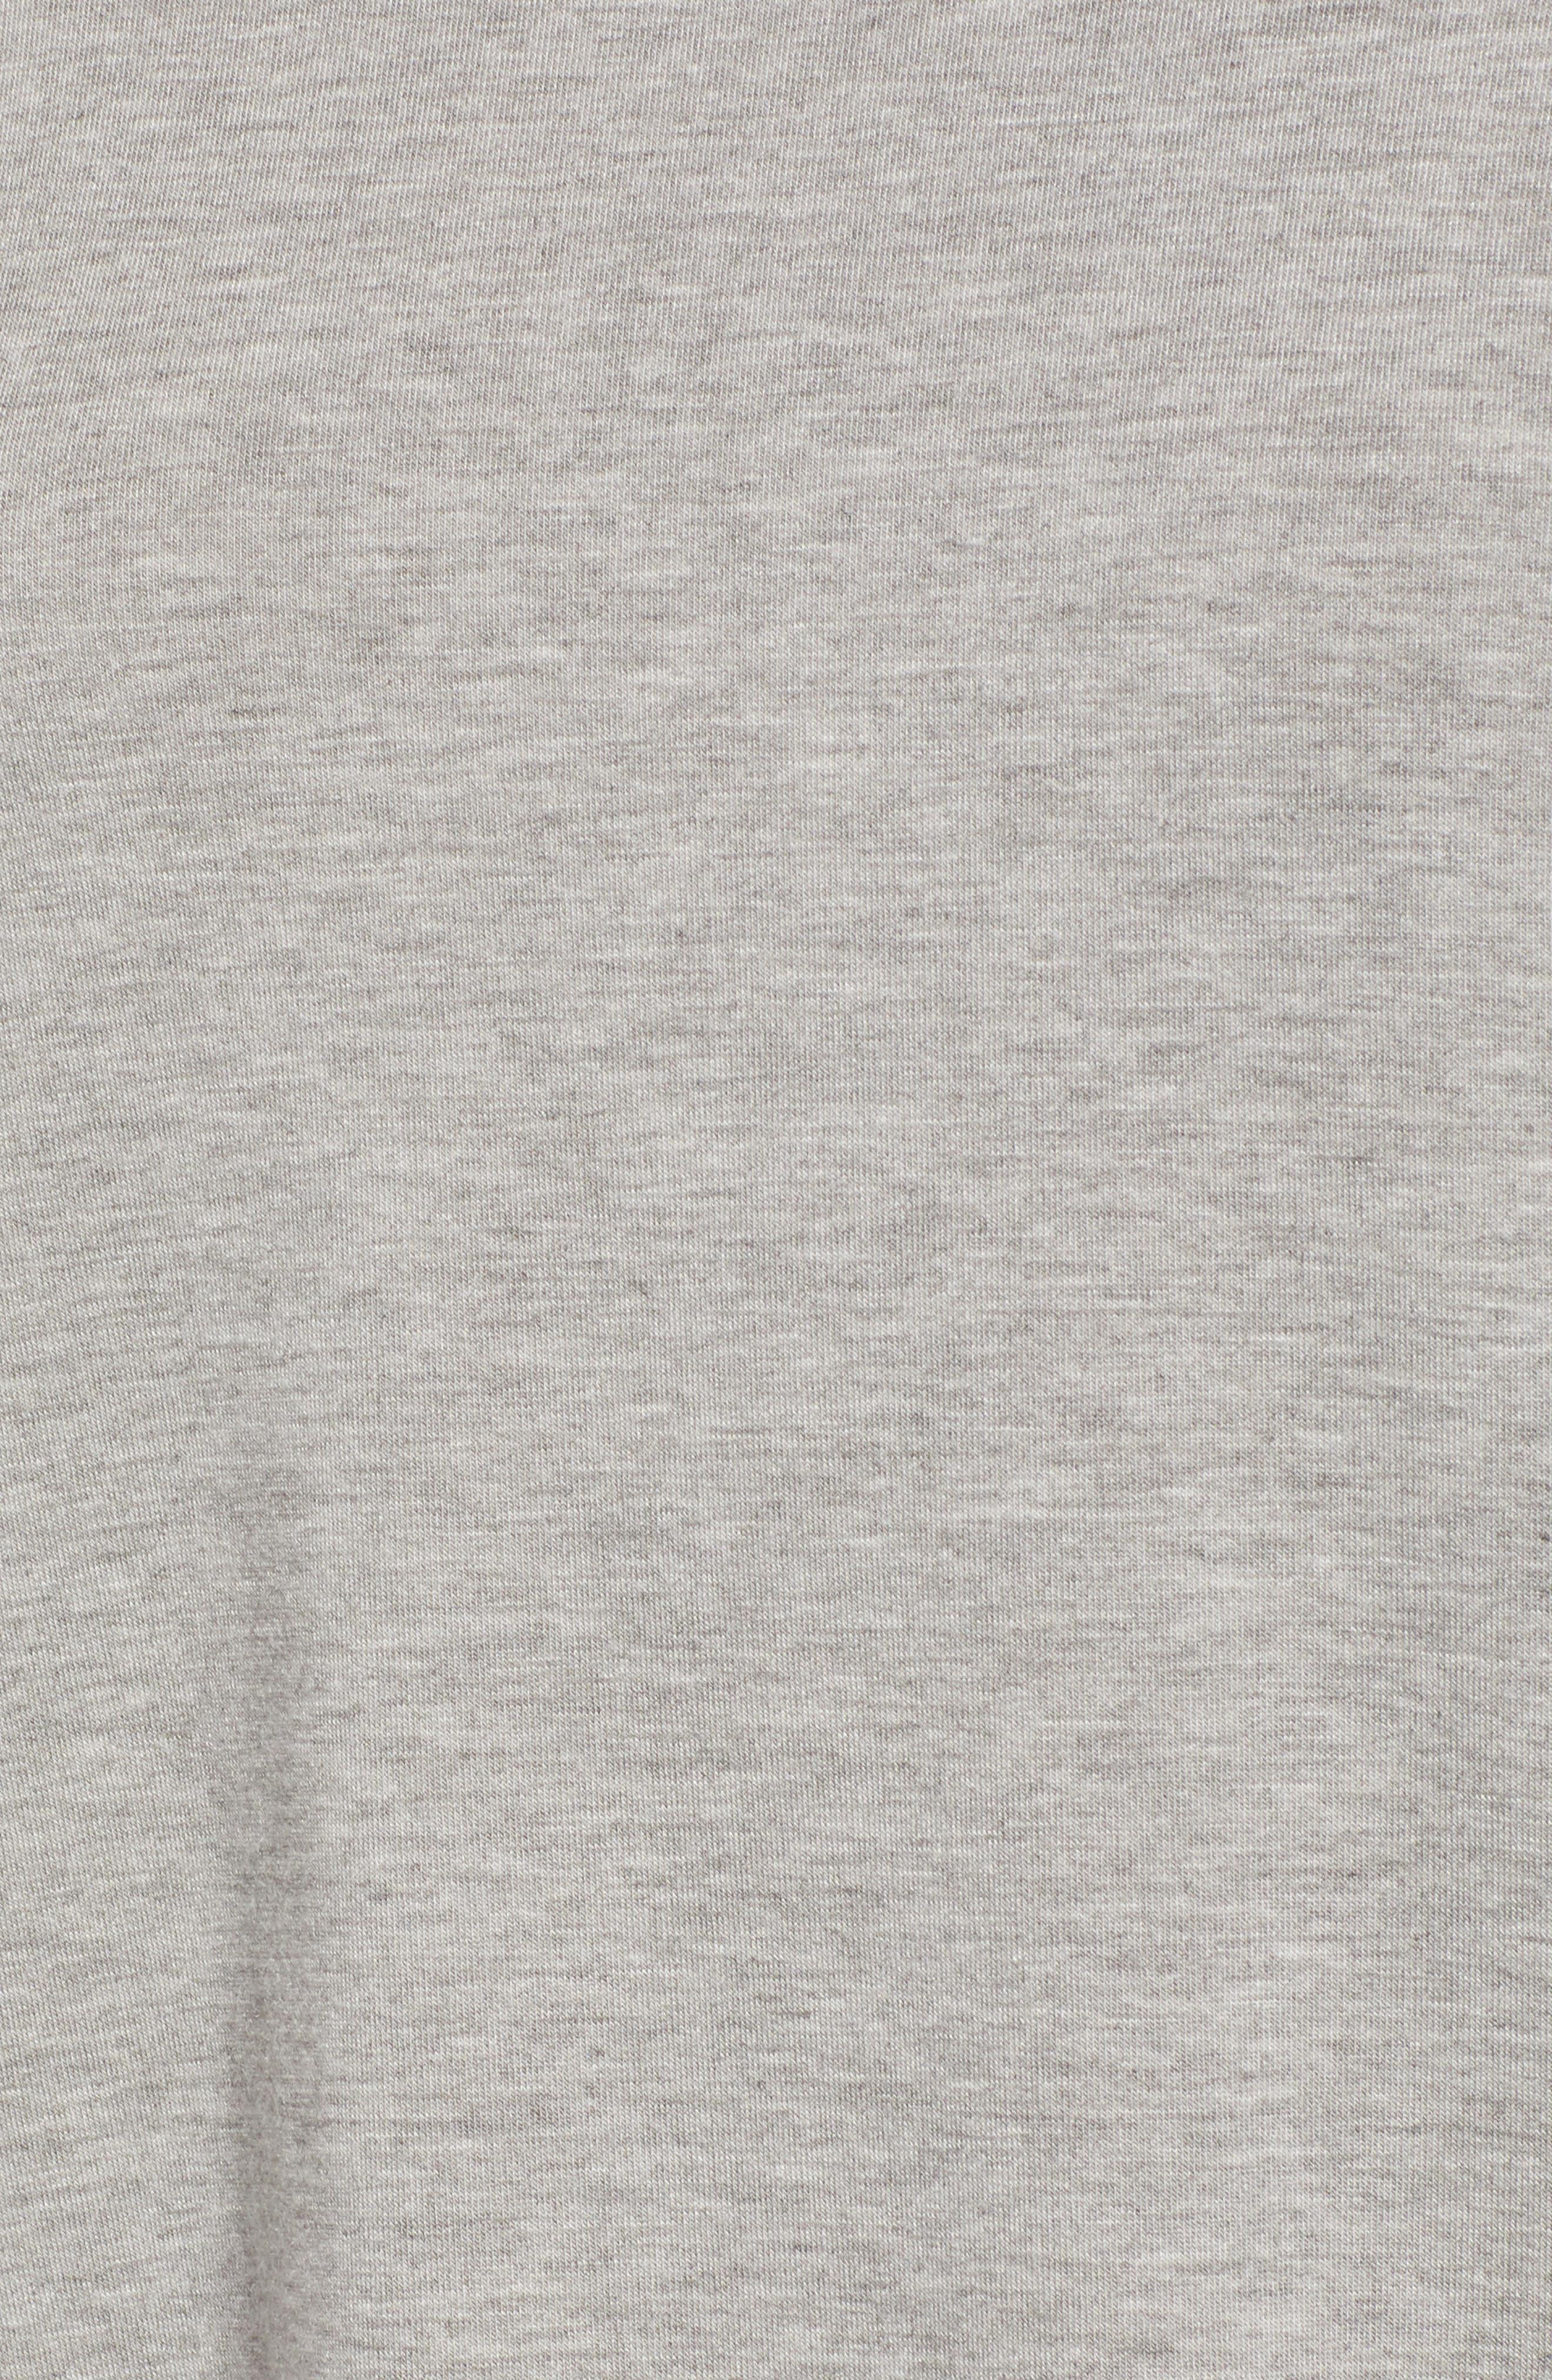 Off-Duty Hooded Sweatshirt,                             Alternate thumbnail 14, color,